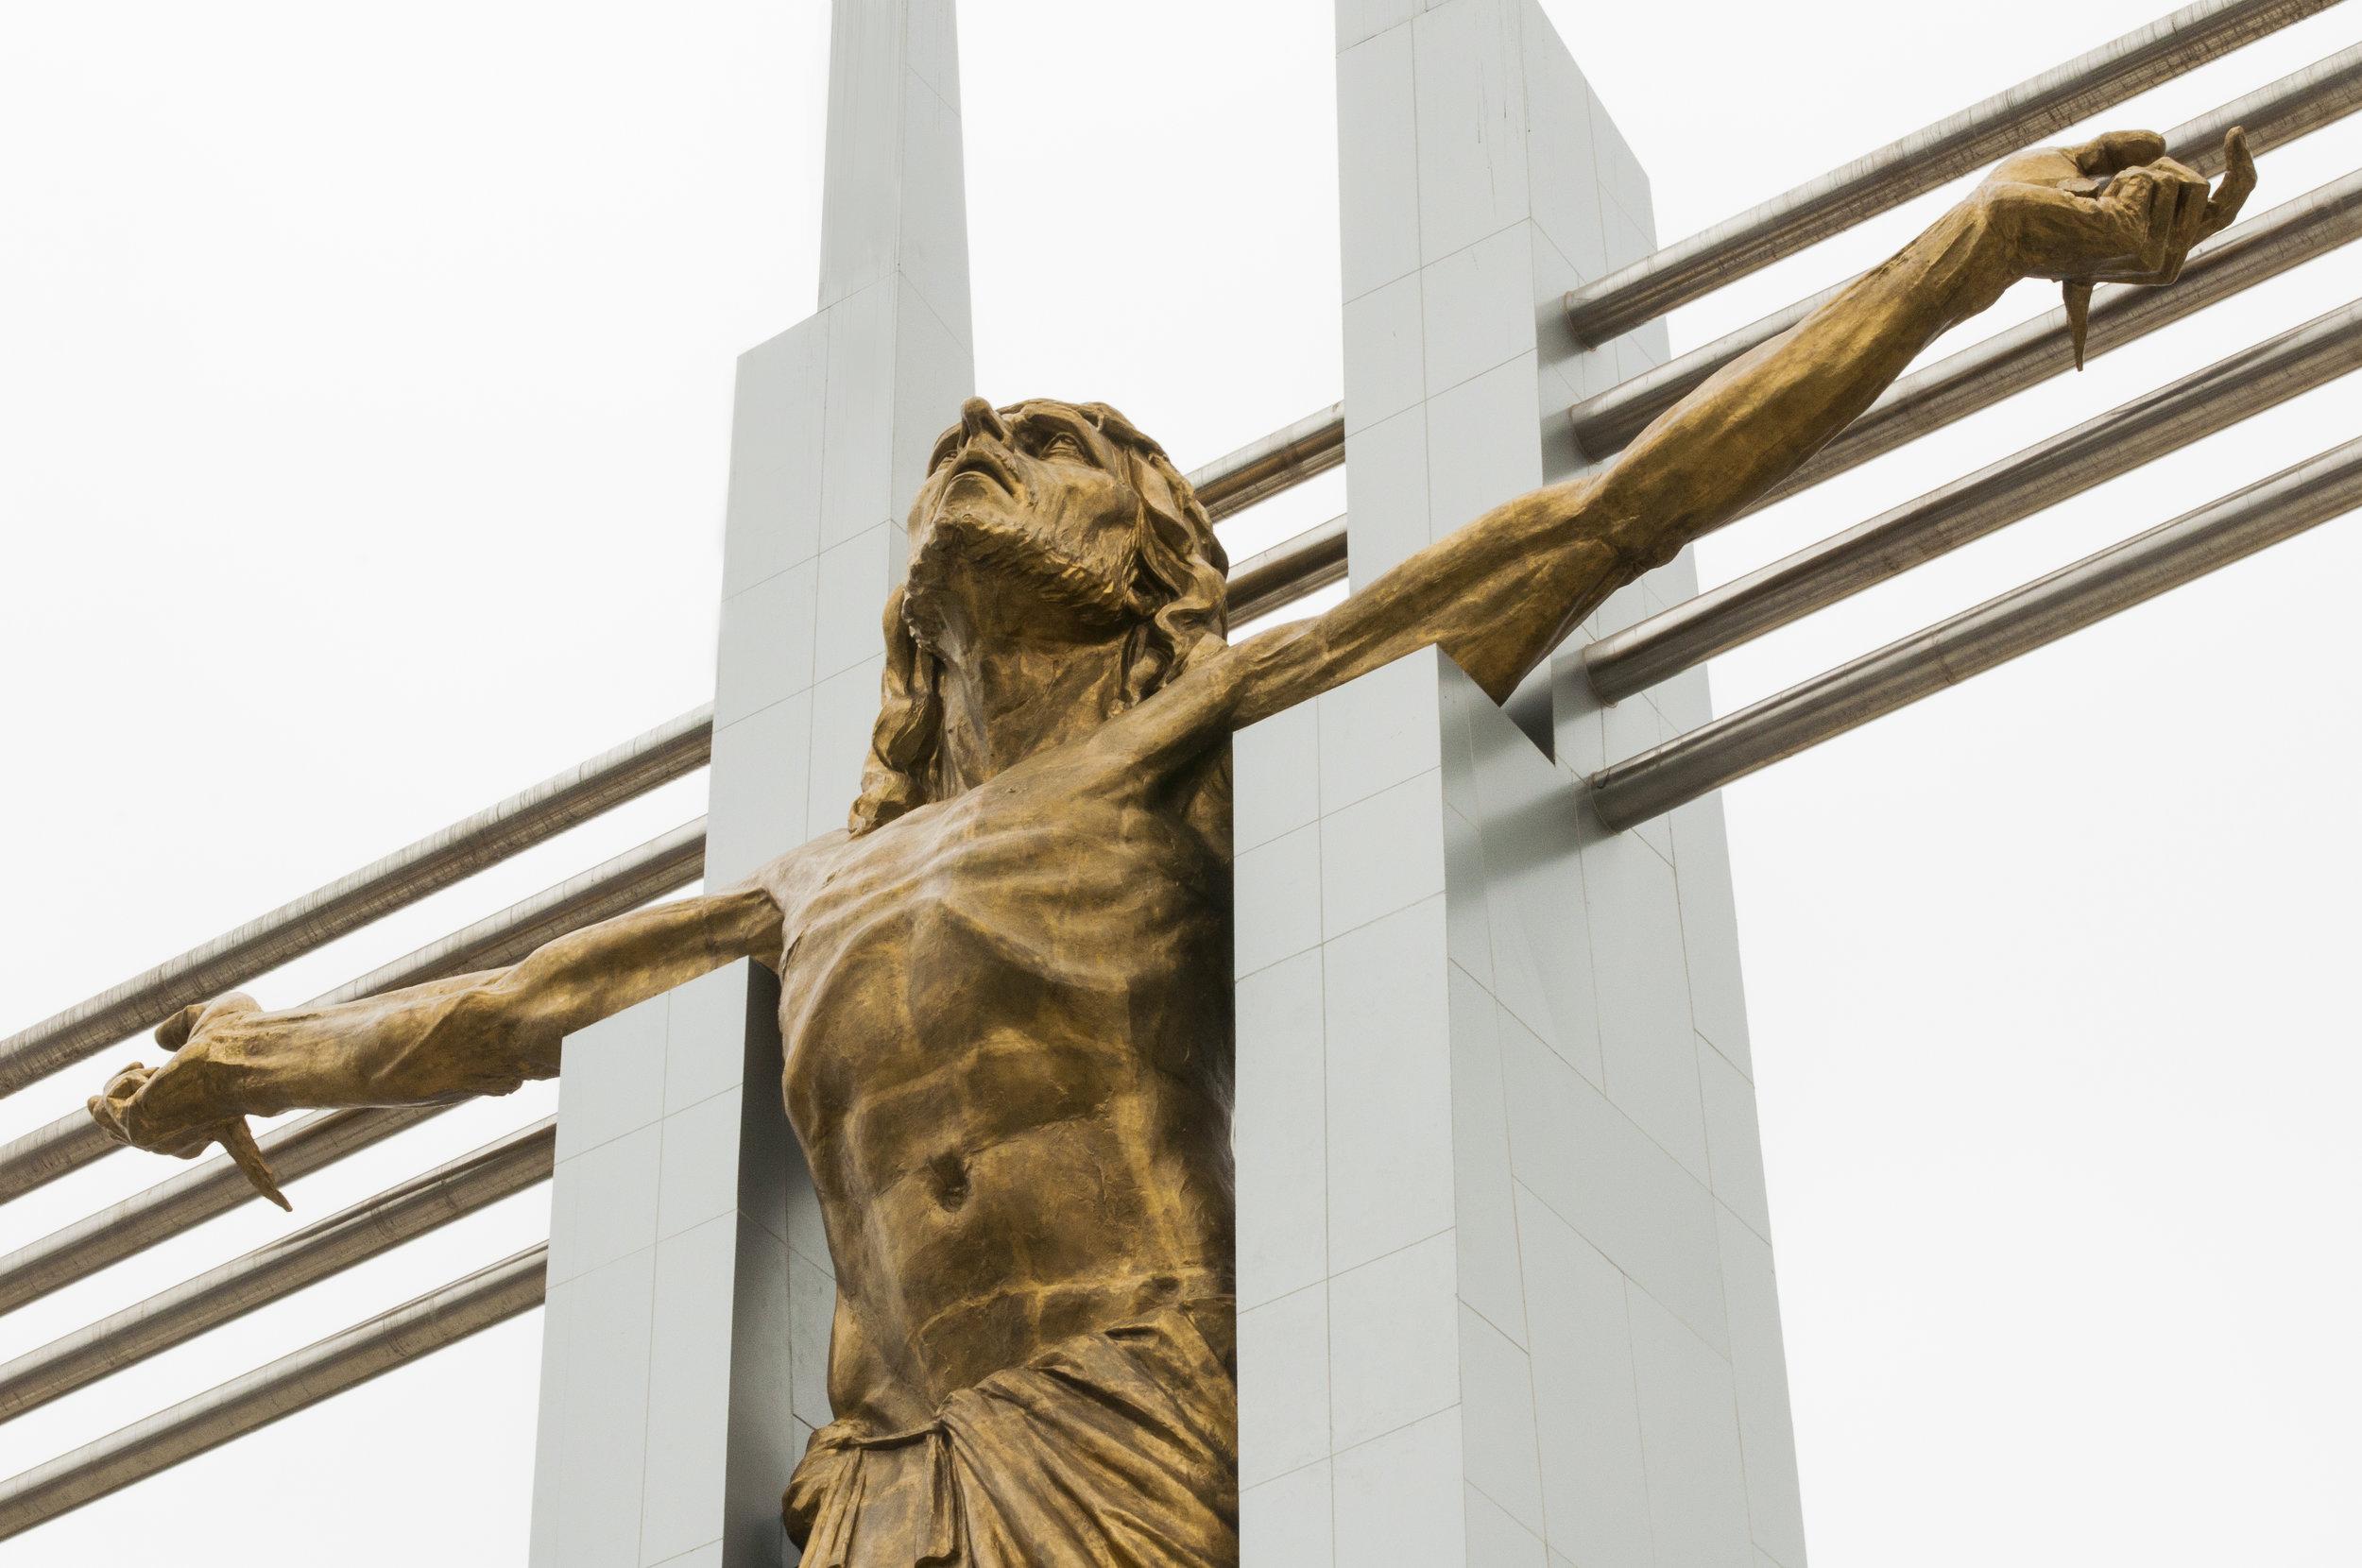 Cristo del Consuelo. Guayaquil, Ecuador.